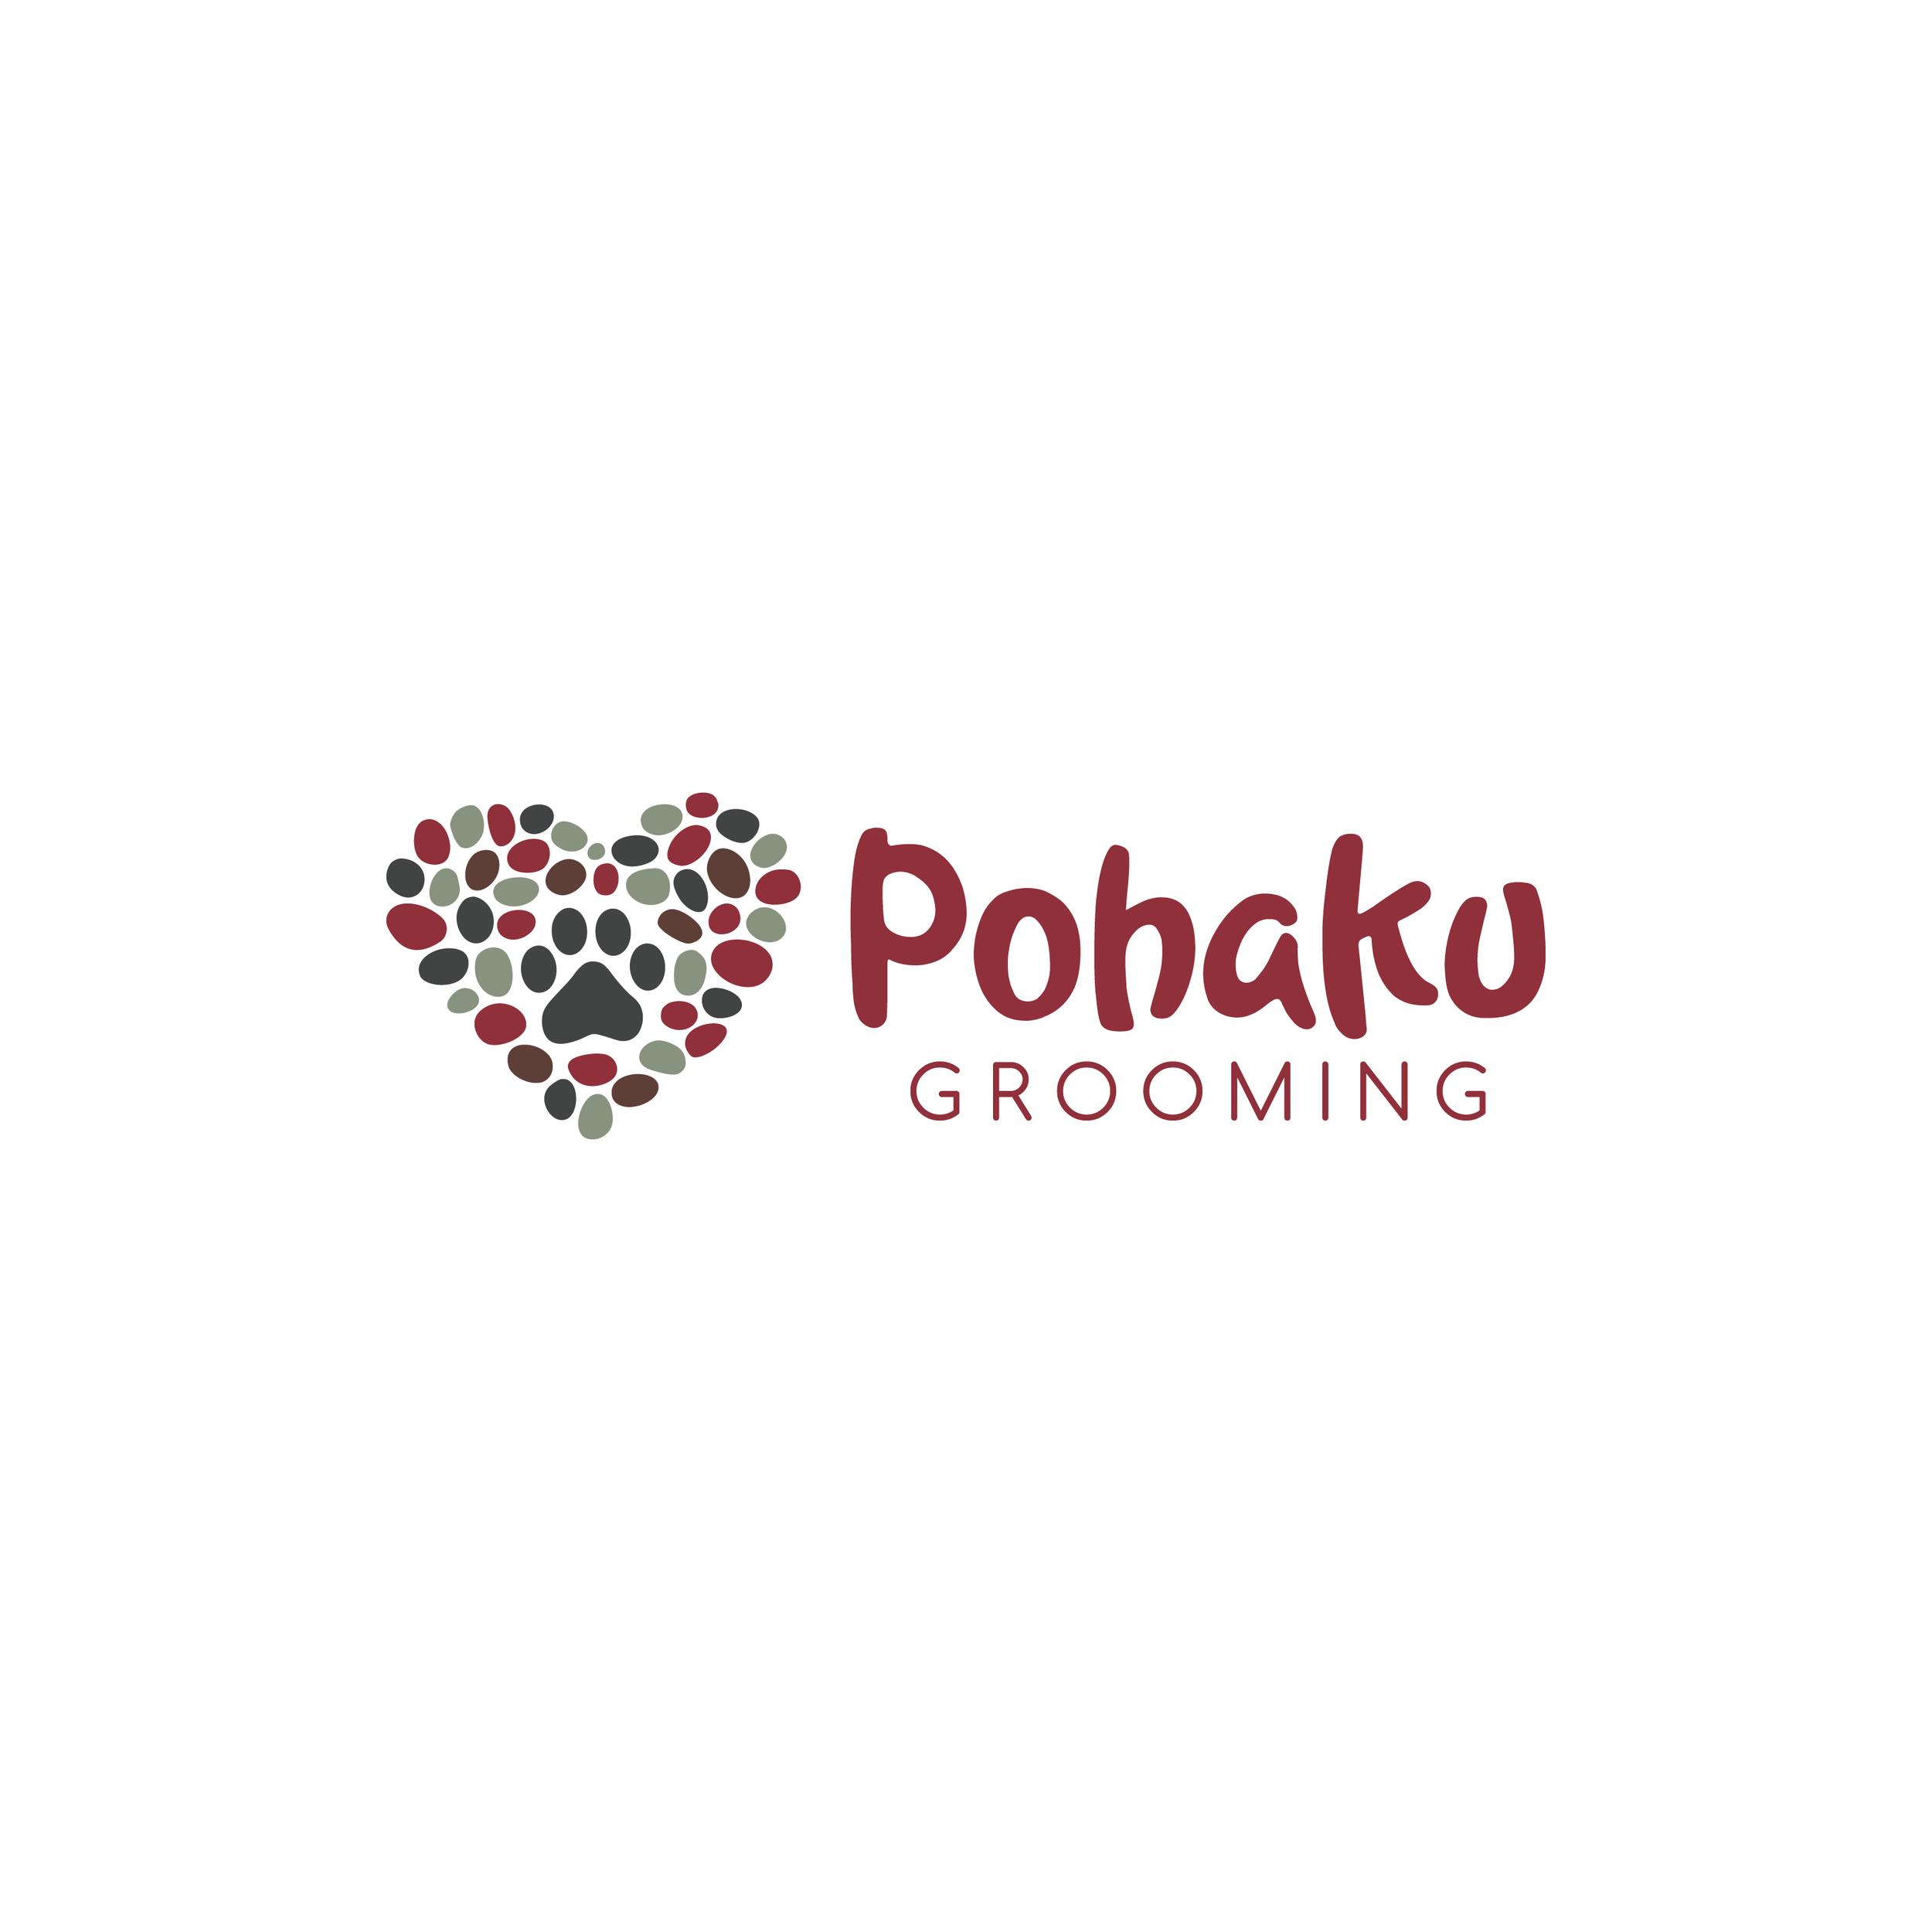 Pohaku Grooming Logo